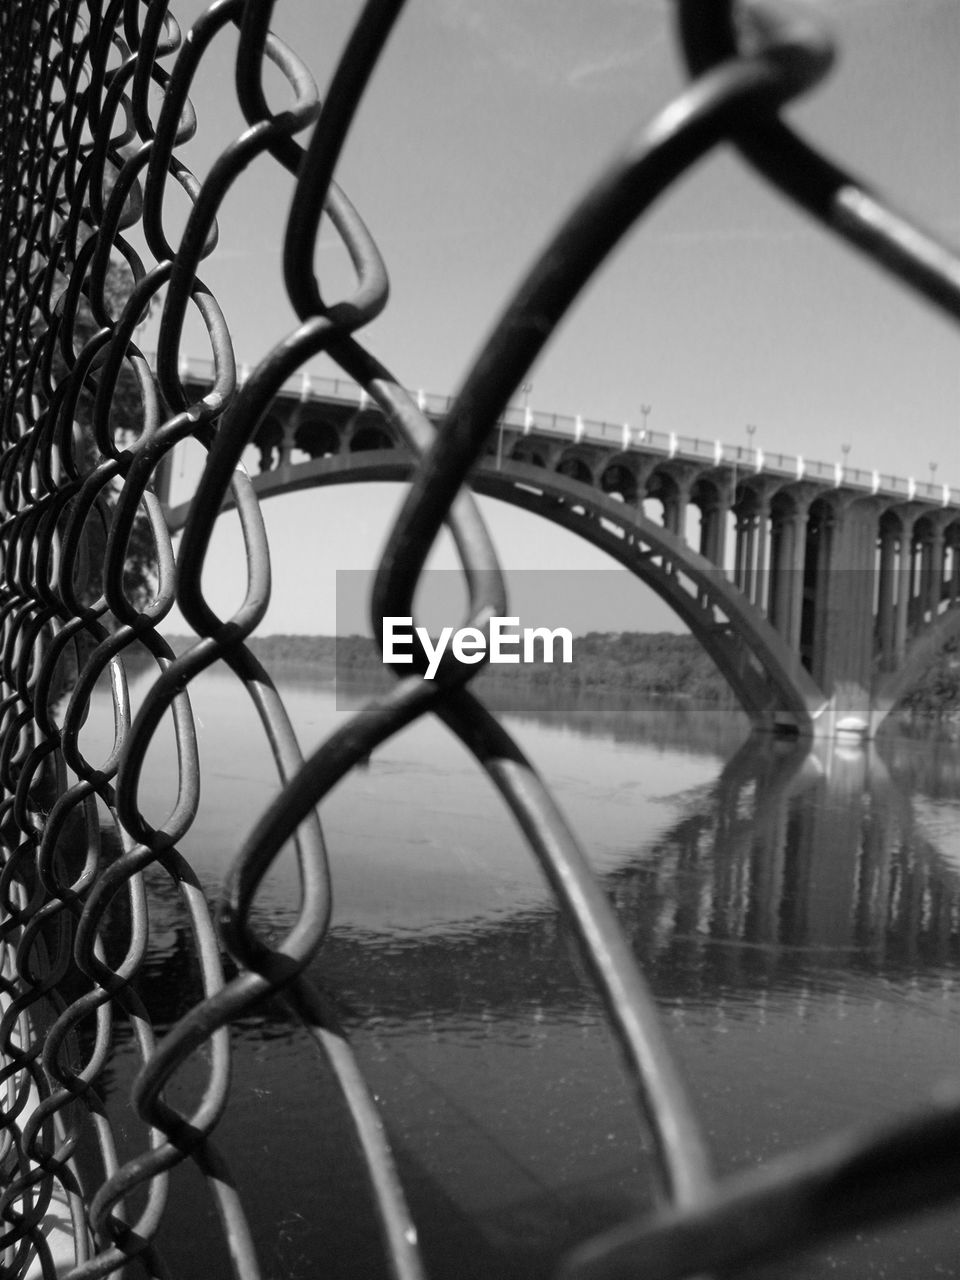 Bridge over river seen through chainlink fence